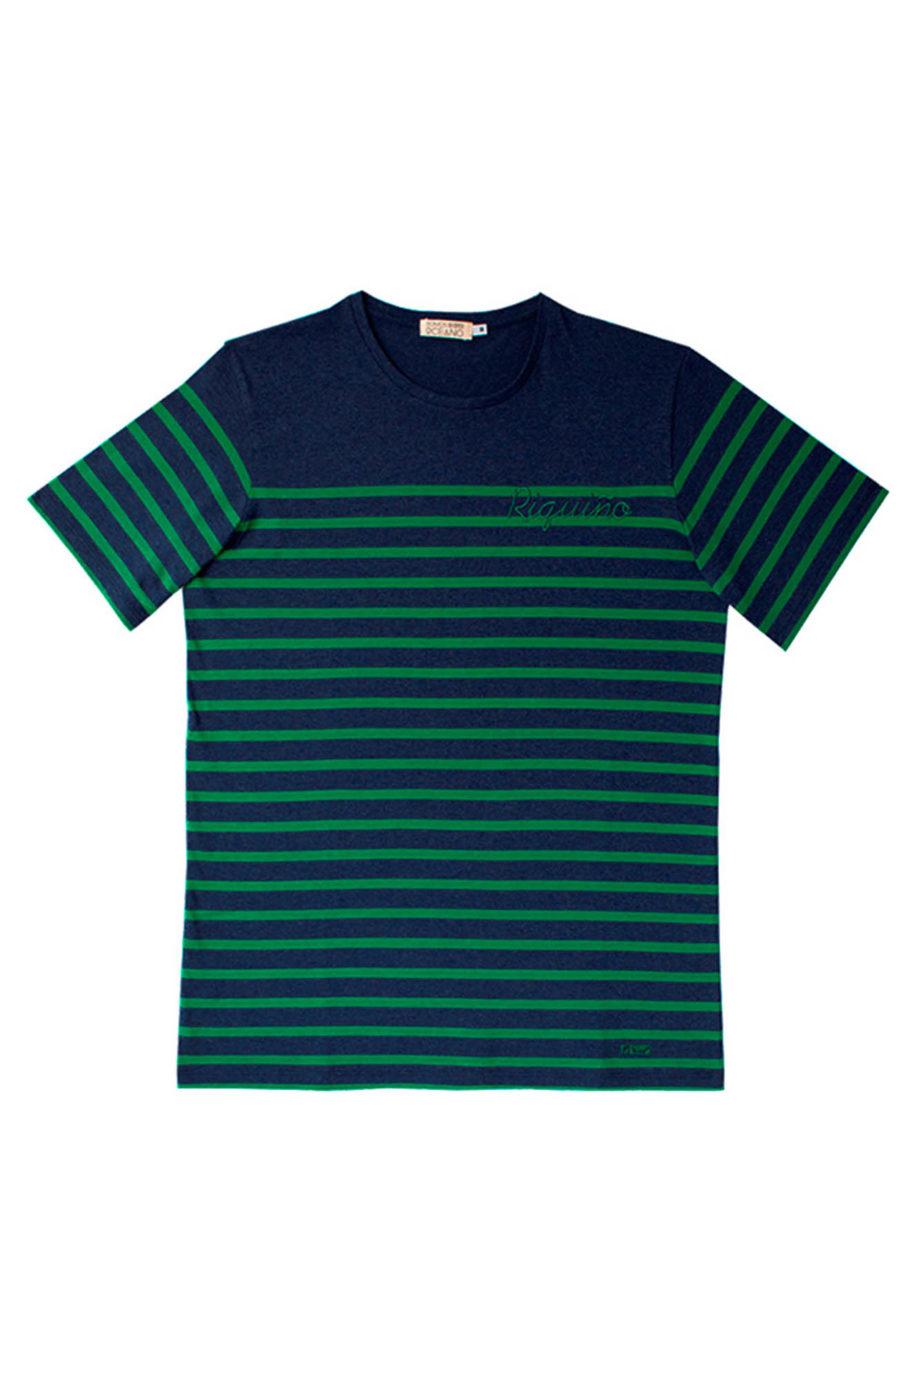 somosoceano-camiseta-hombre-riquiño